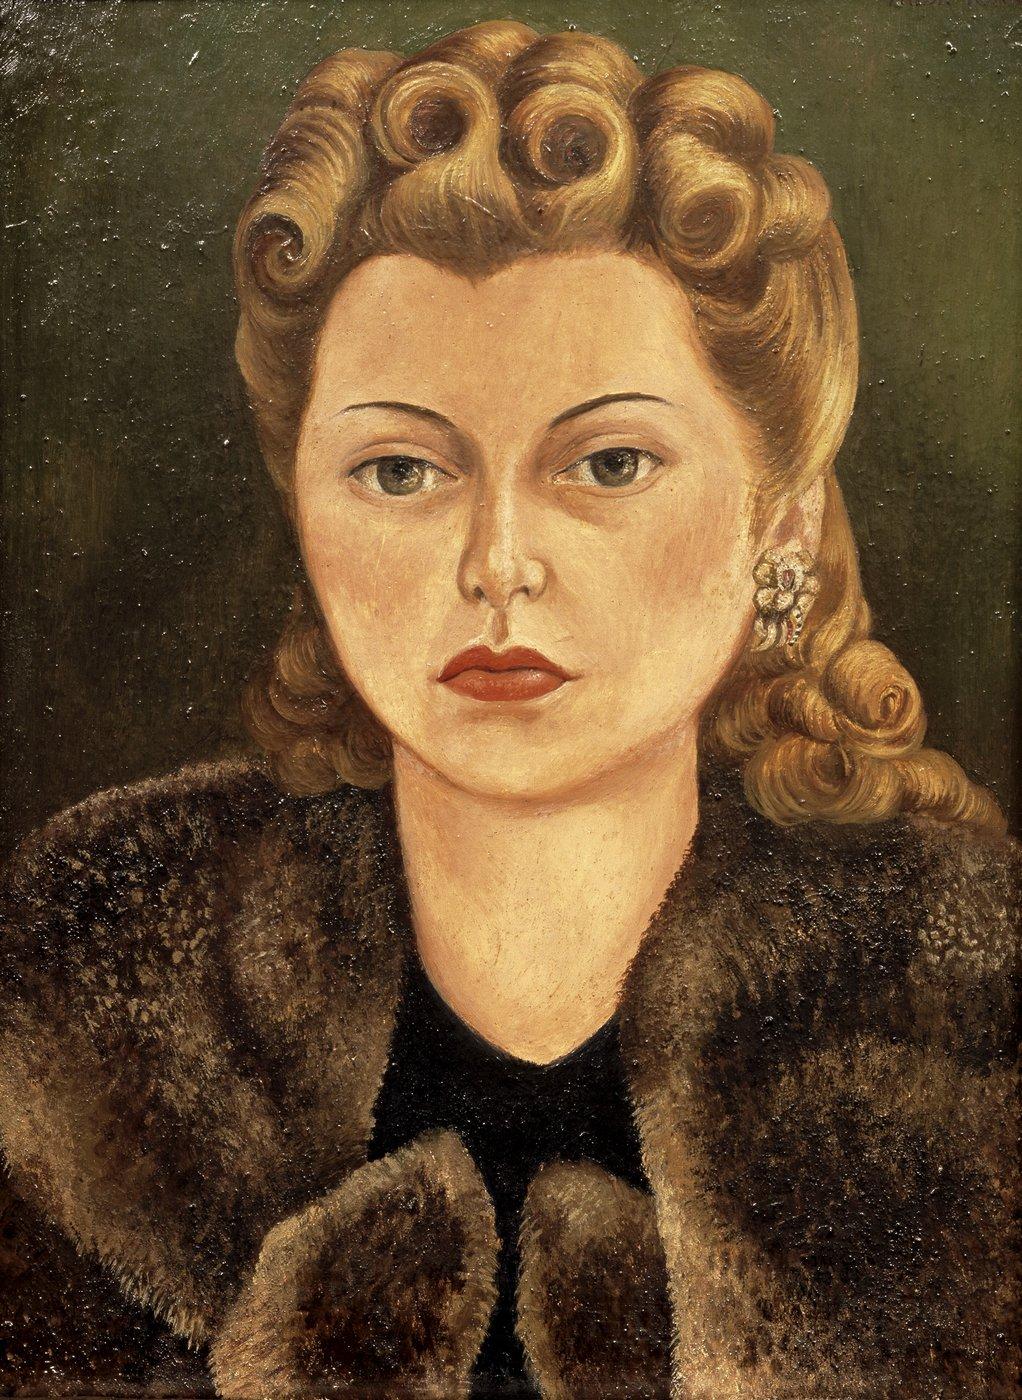 frida kahlo and diego rivera art gallery nsw frida kahlo portrait of natasha gelman 1943